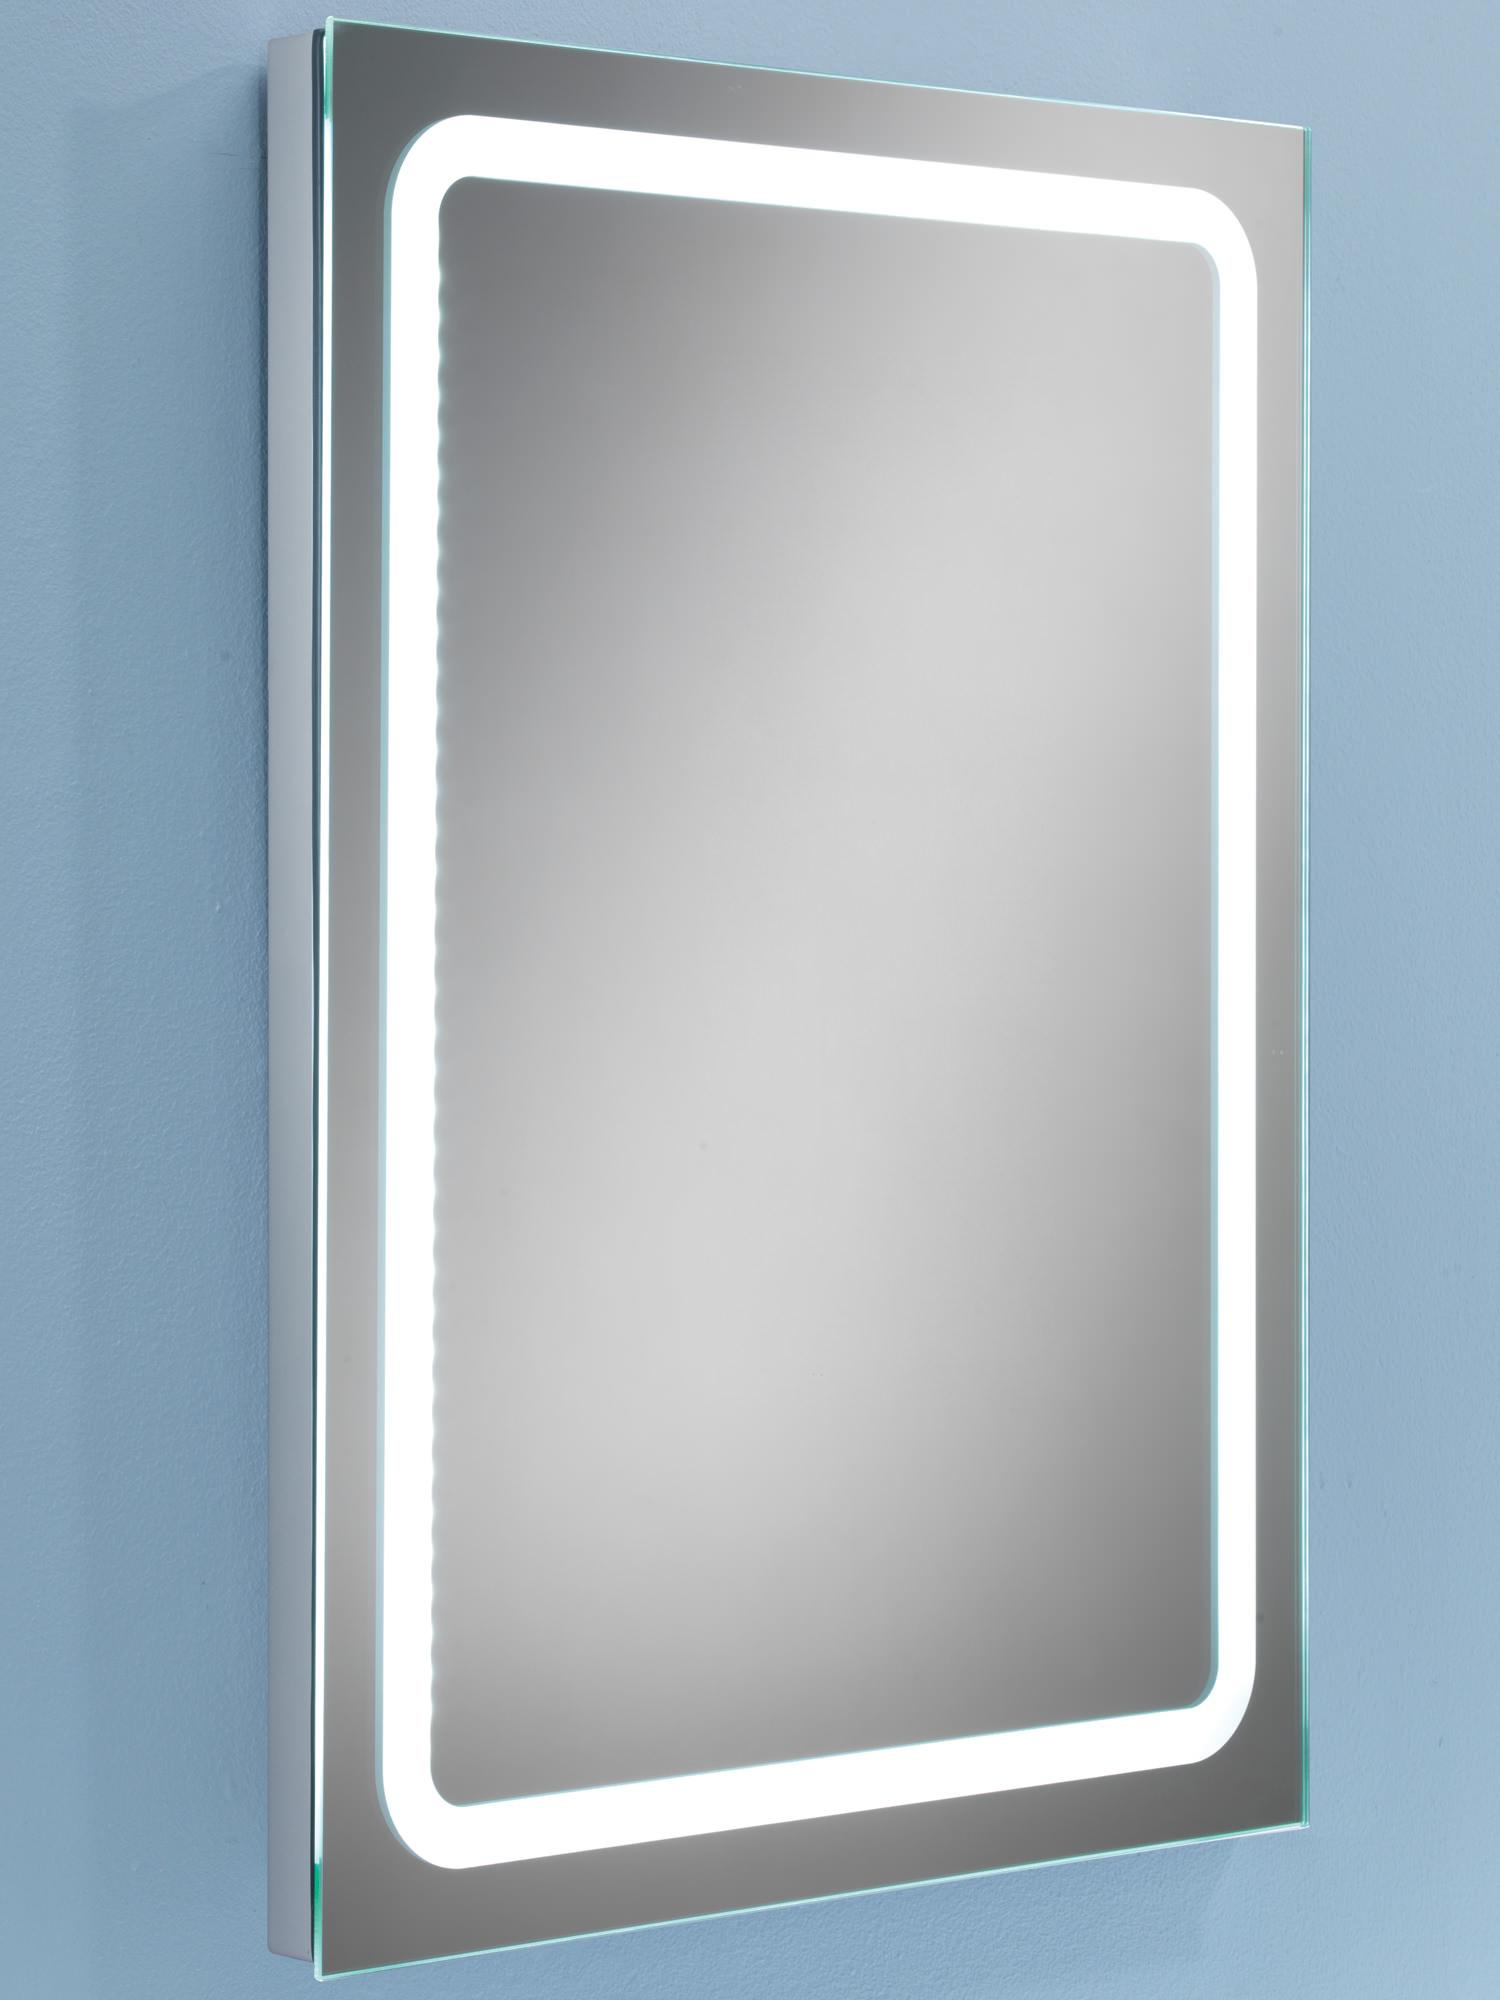 Hib Scarlet Steam Free Led Back Lit Bathroom Mirror 800 X